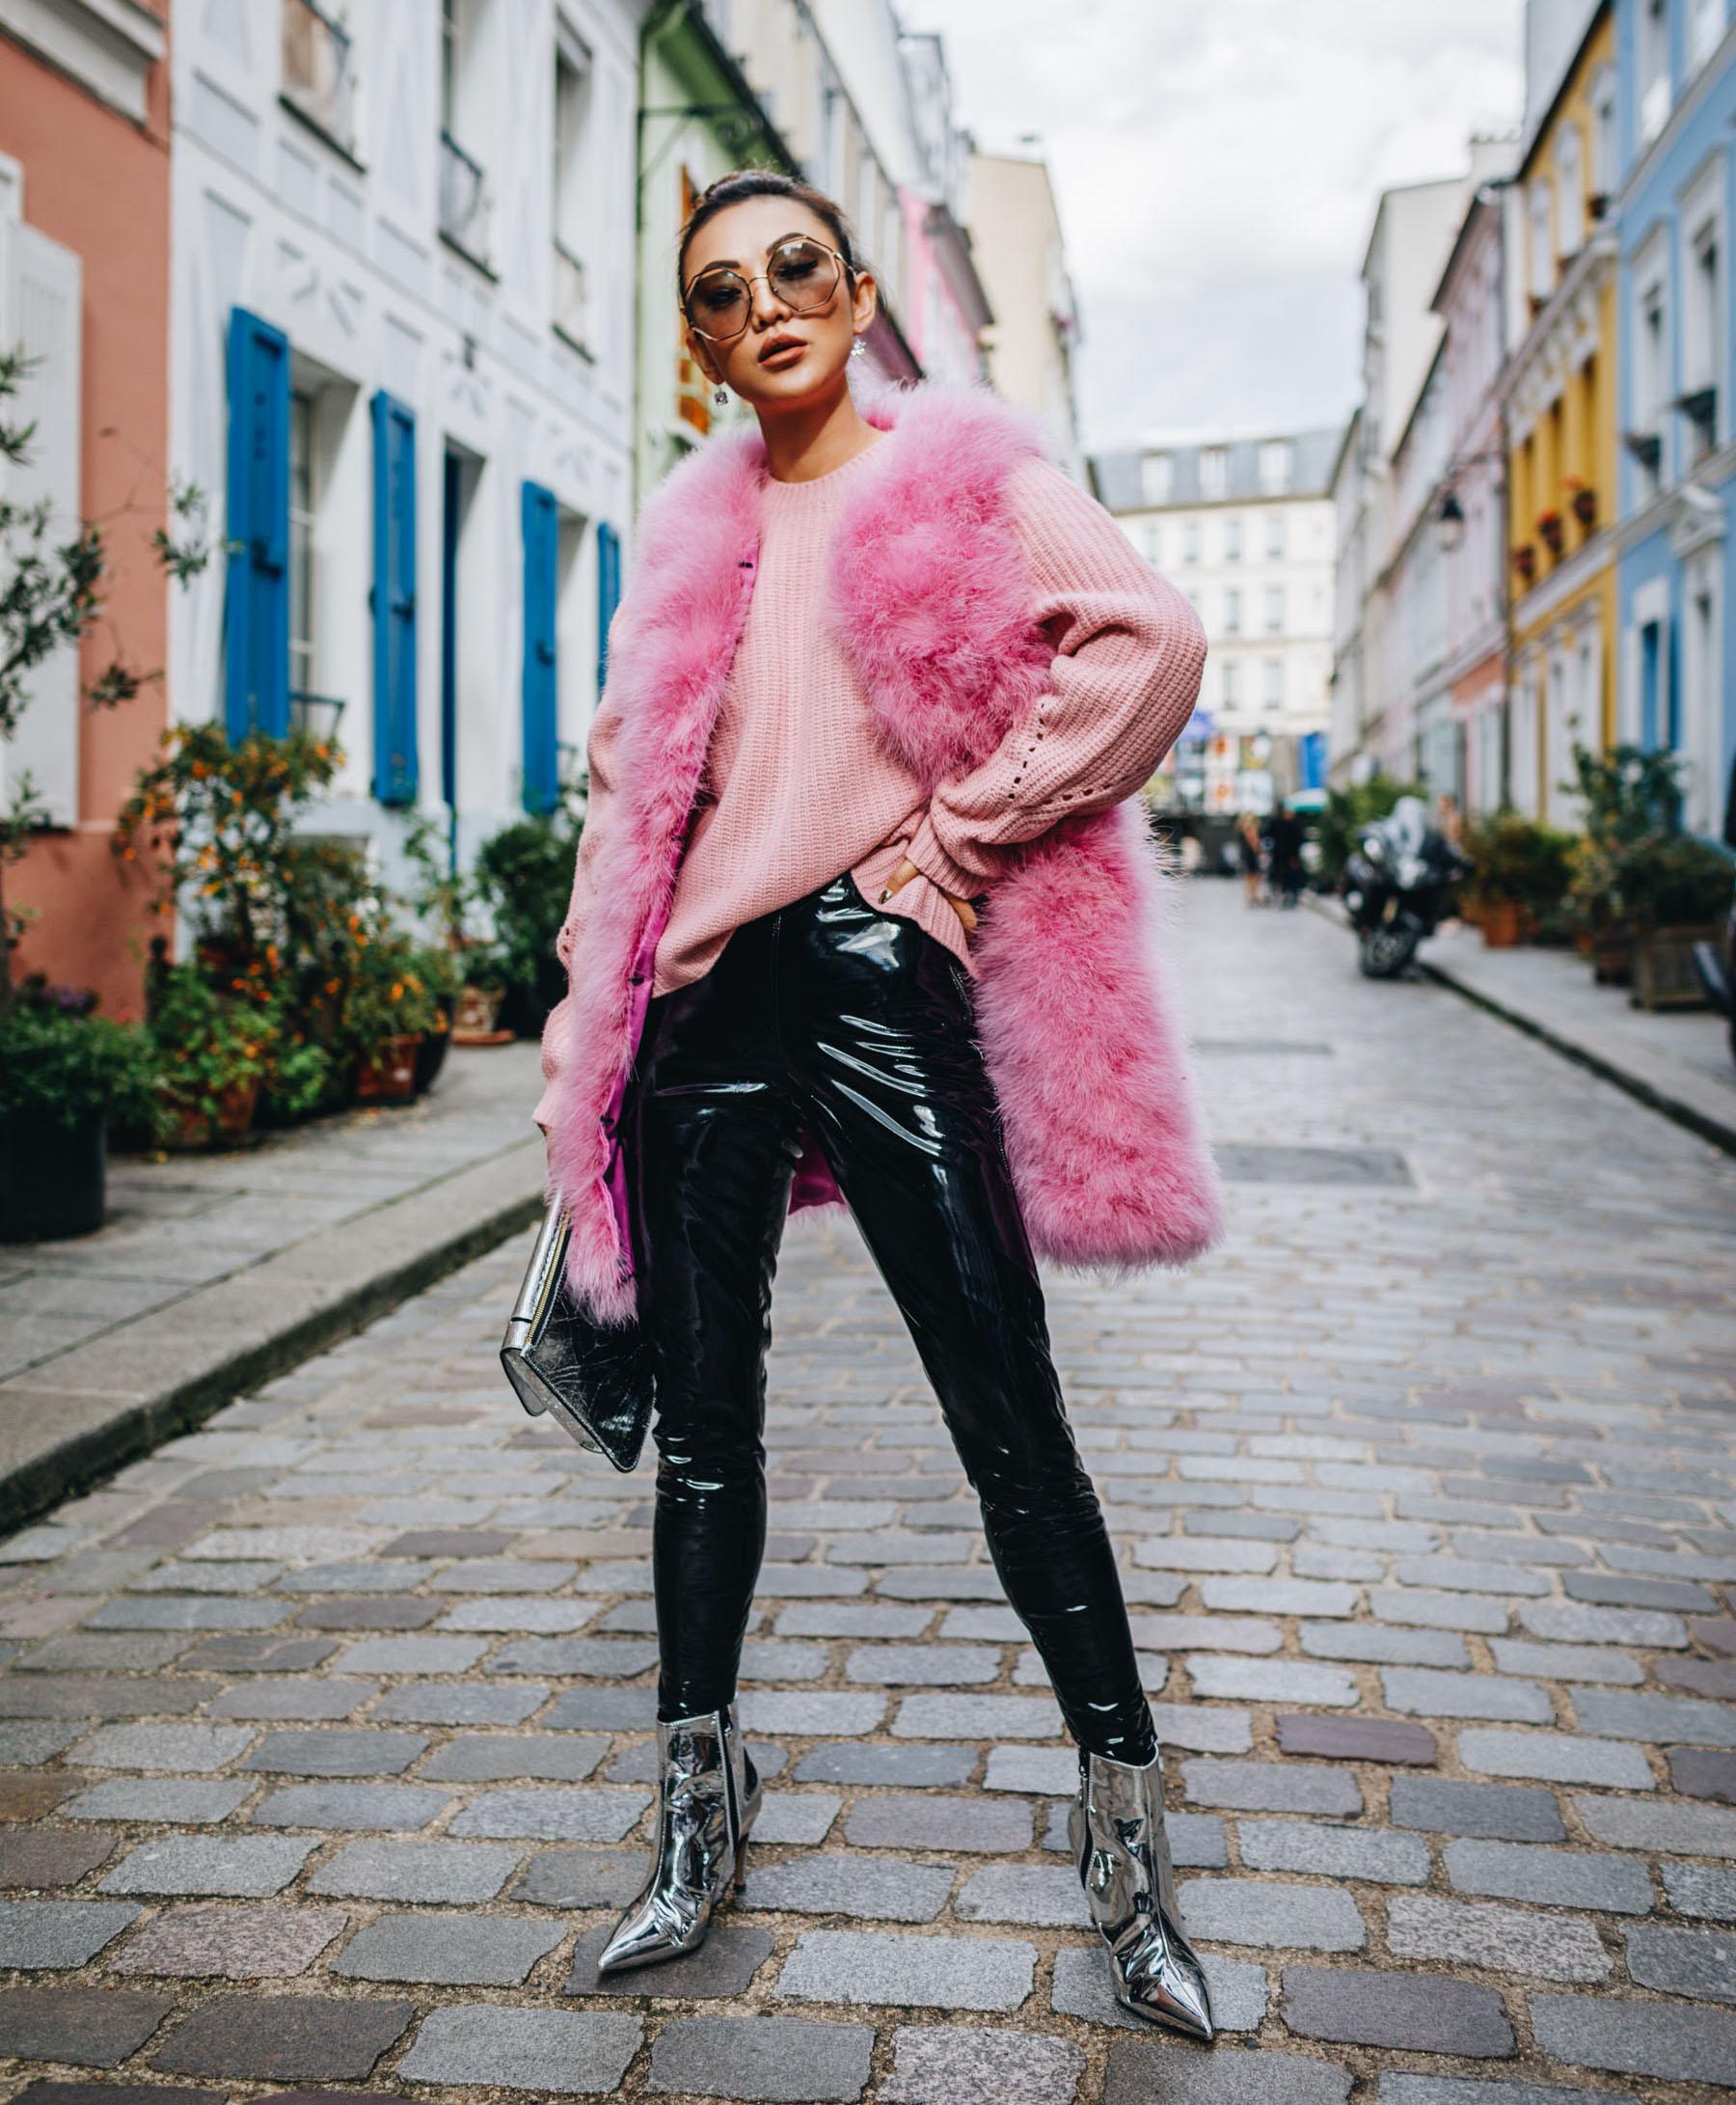 How to Wear Vinyl - Vinyl leggings, NYFW Street Style // Notjessfashion.com